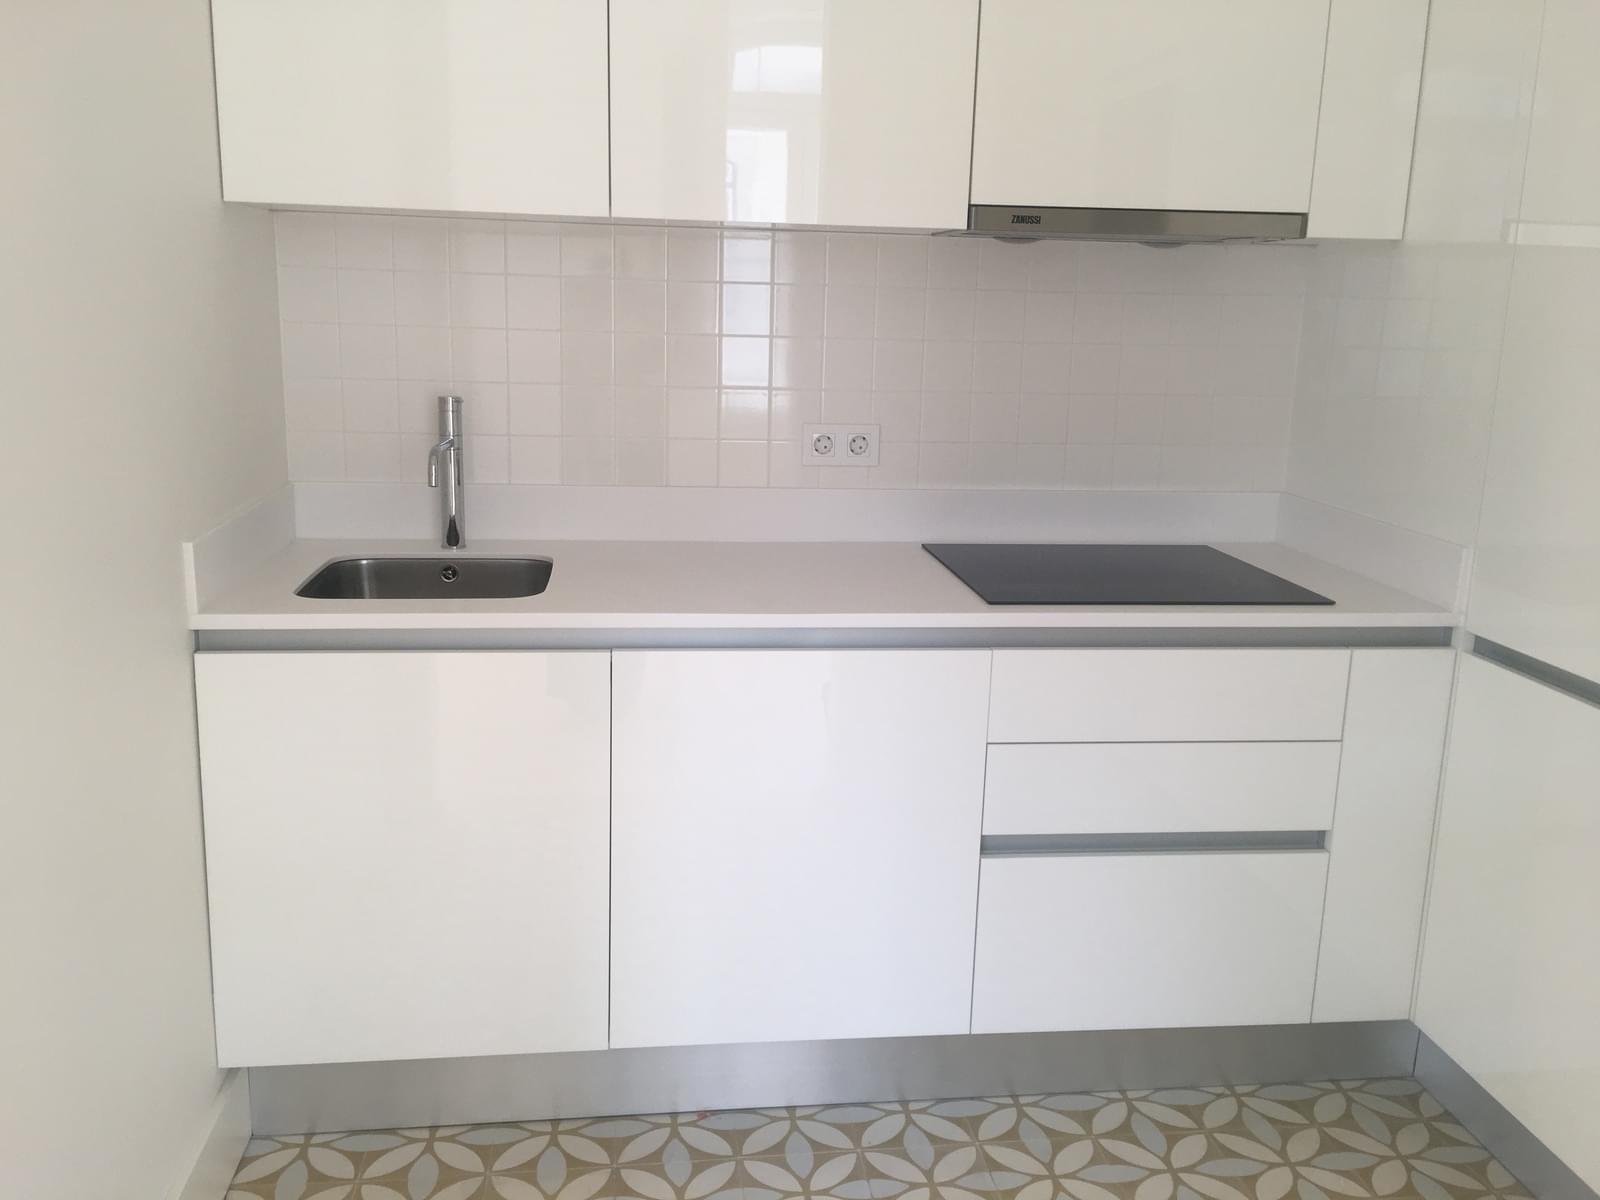 pf17866-apartamento-t1-lisboa-b741705d-49b9-4993-b887-66399afd1b29